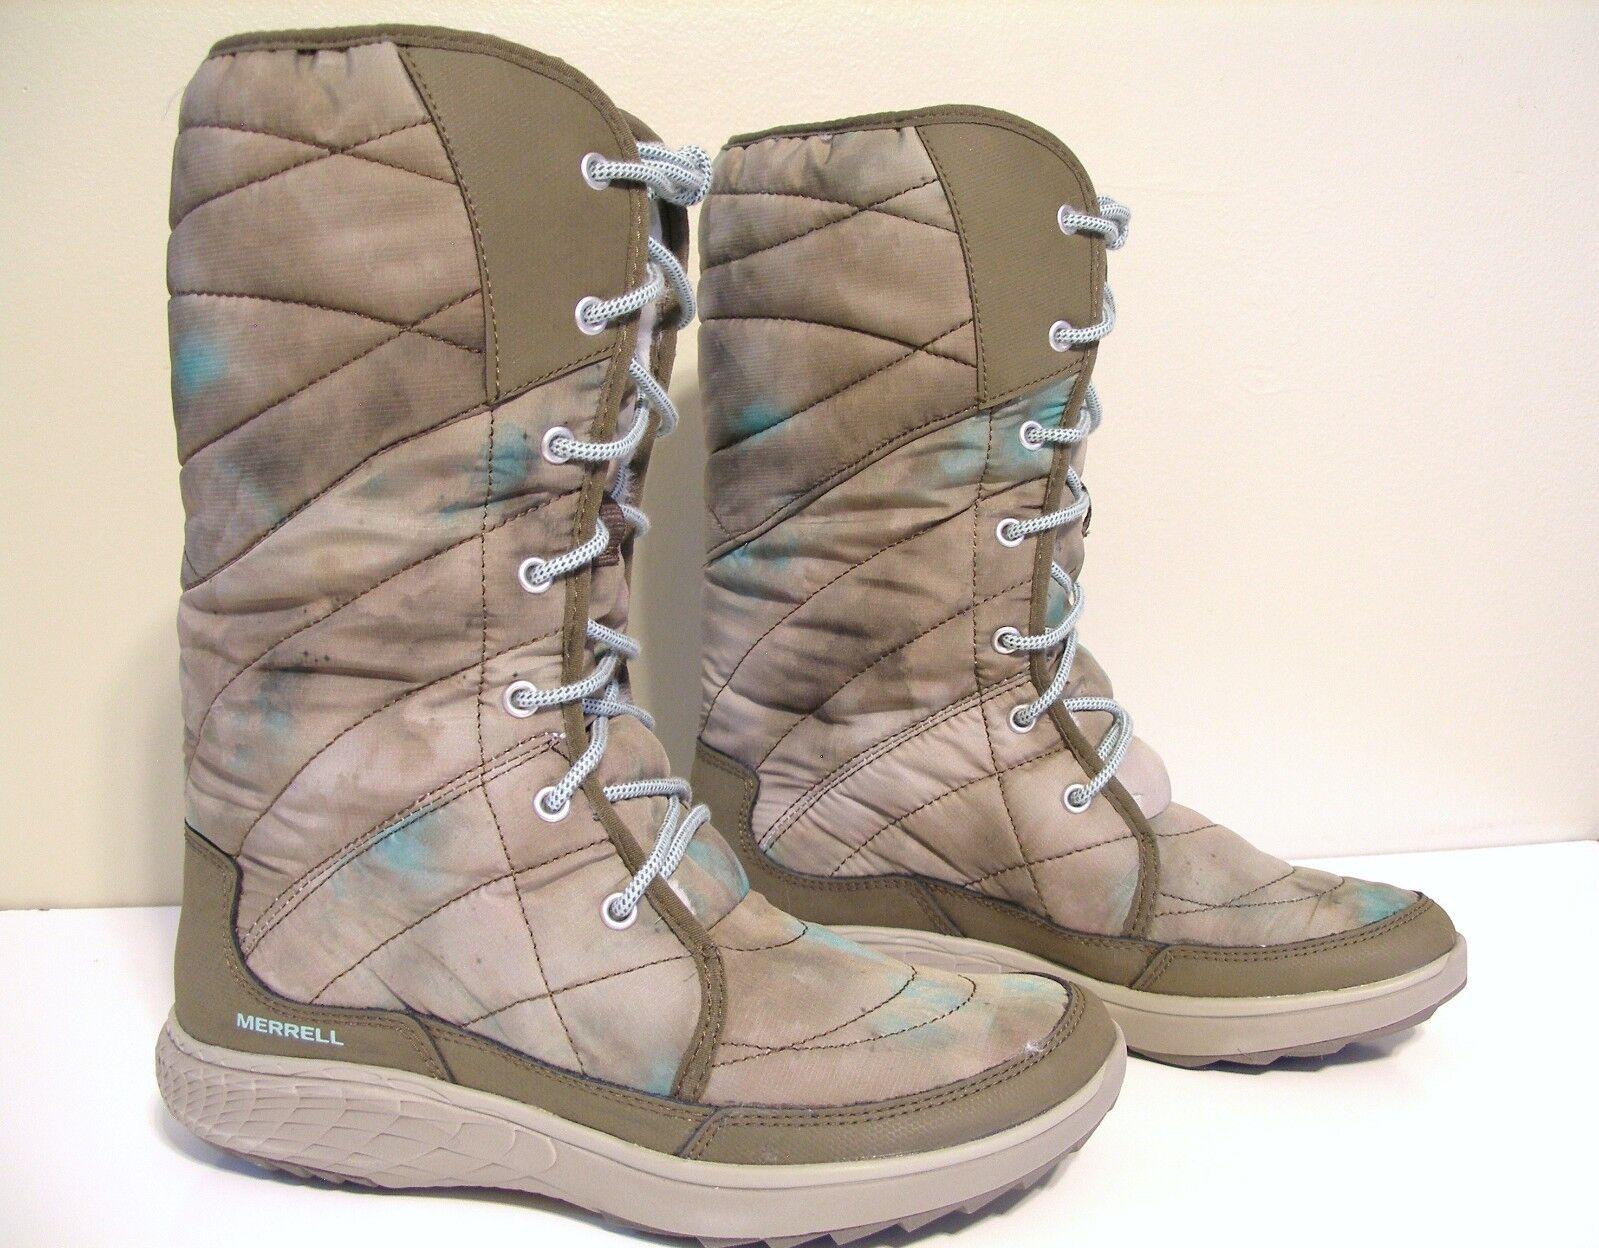 New MERRELL Pechora Peak Winter Boot Size 7 Taupe Tan Green camouflage J42762